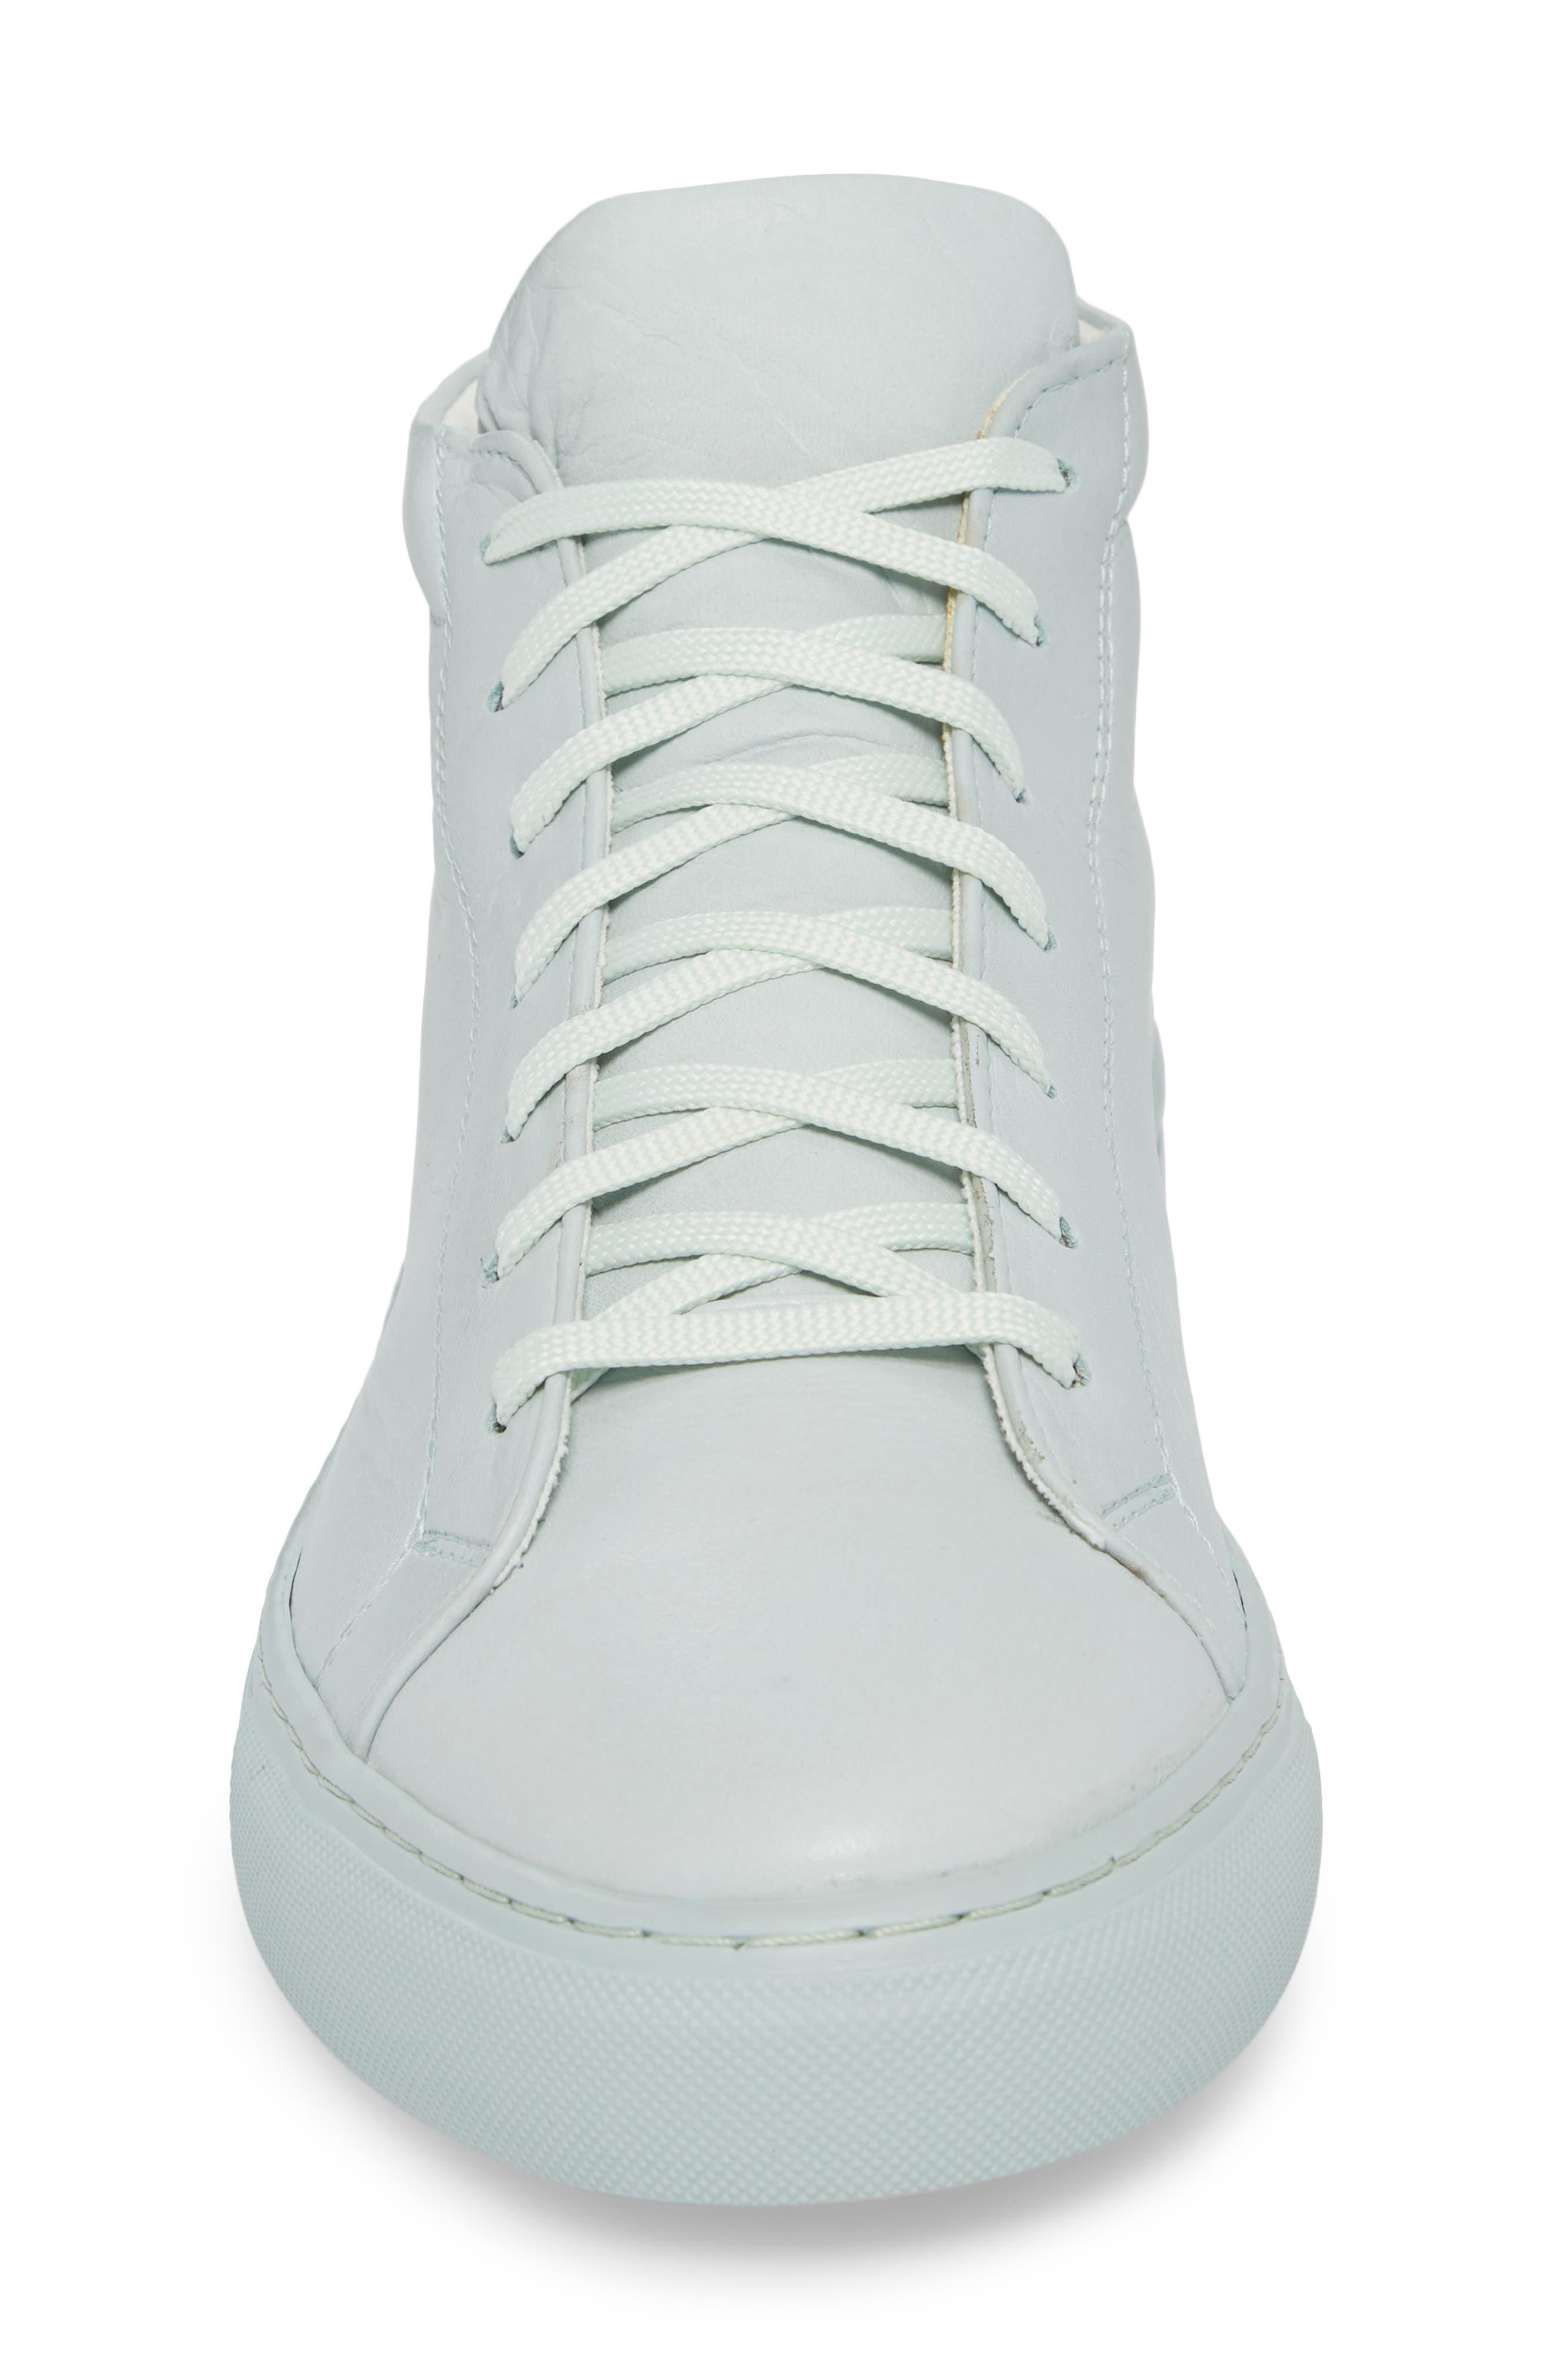 Lexington Mid Top Sneaker,                             Alternate thumbnail 4, color,                             Mint Green Leather